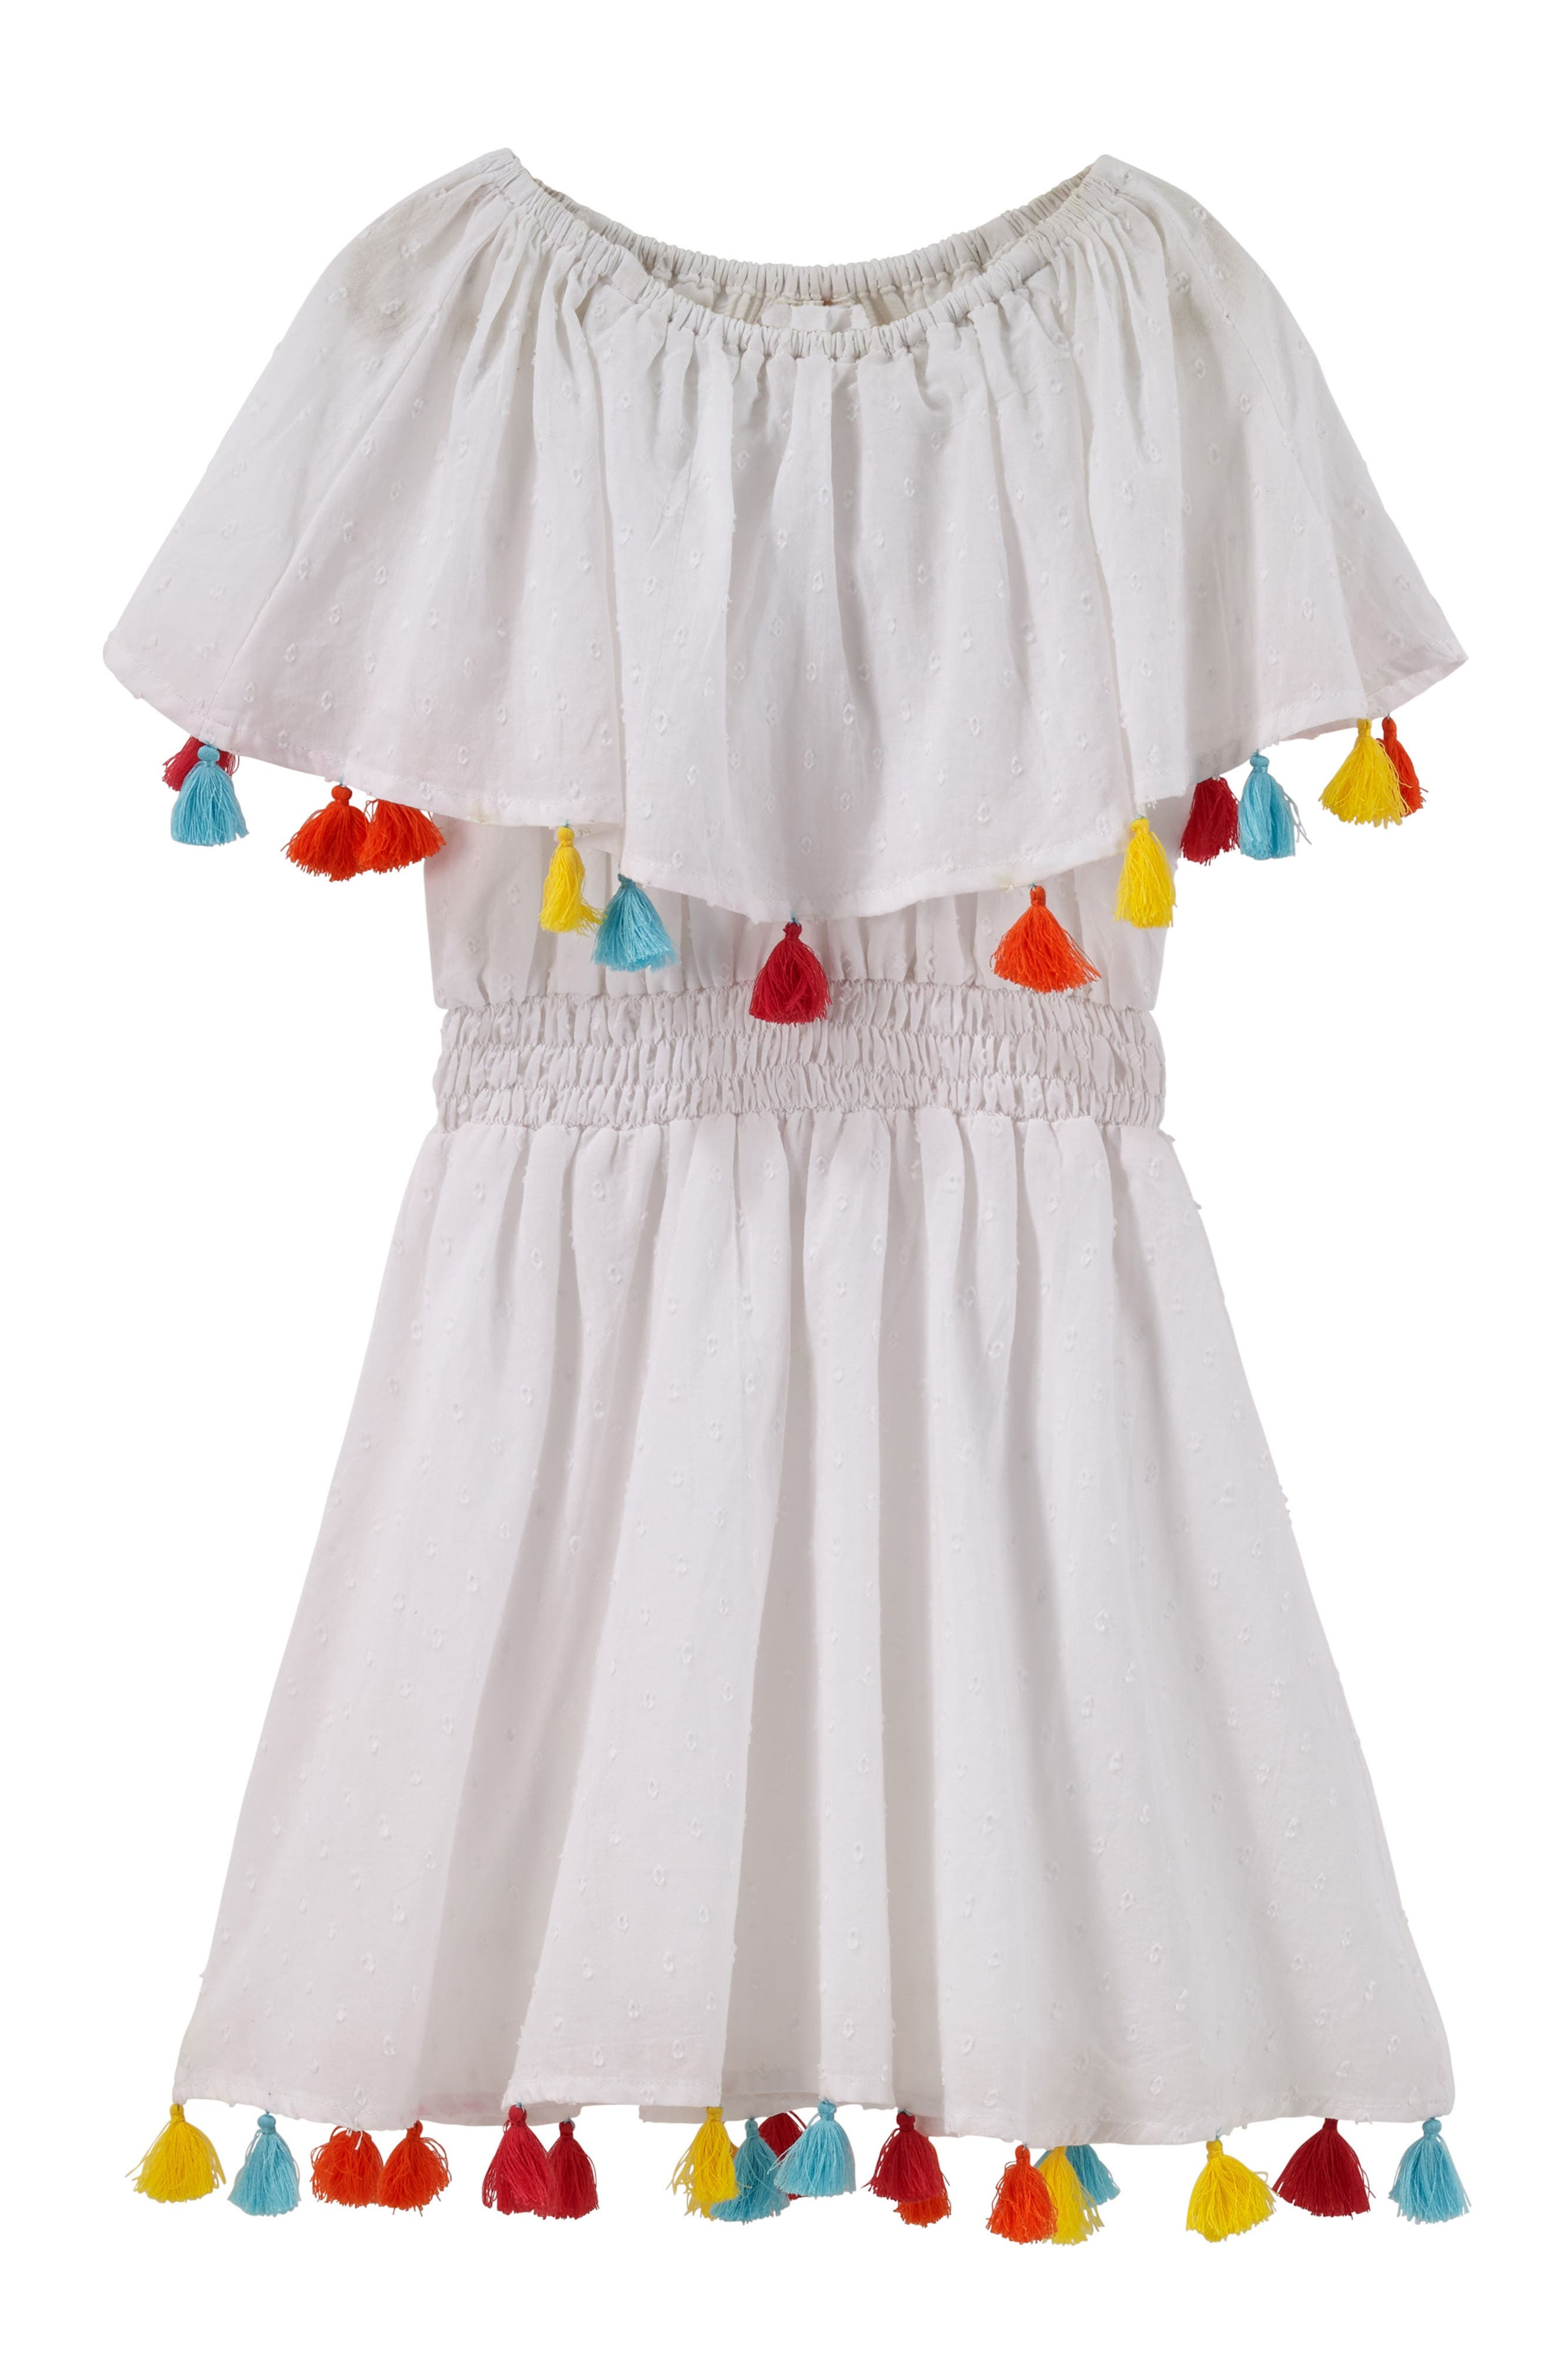 Main Image - Masala Baby Fun Fair Tassel Dress (Toddler Girls)